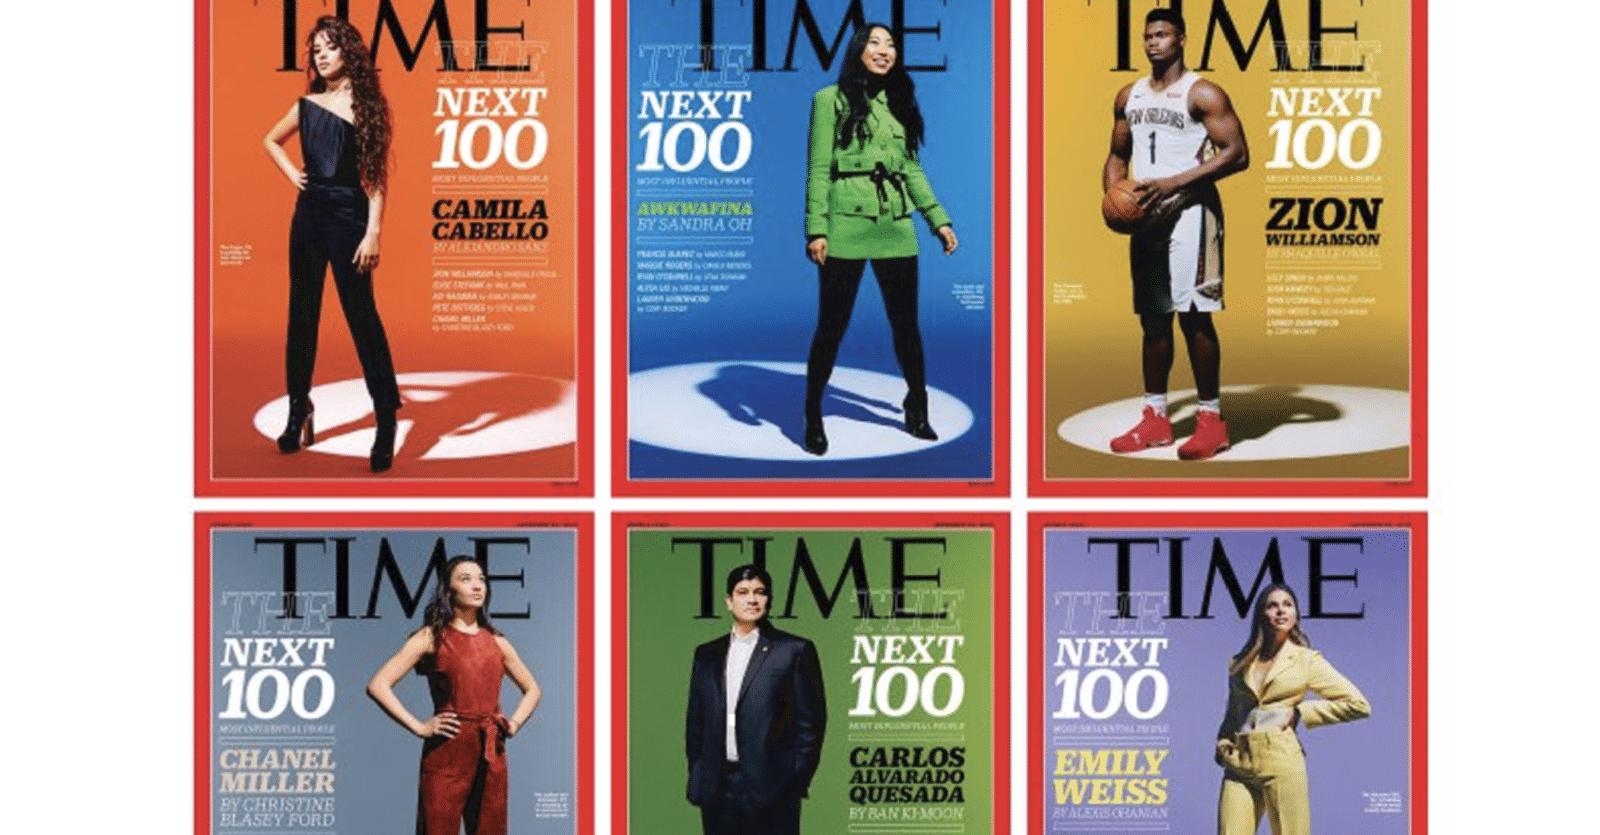 Editor-in-Chief นิตยสาร Time เล่าวิธีเลือก TIME 100 NEXT ทีนิยามเปลียนไป คนไทยได้ 3 คน